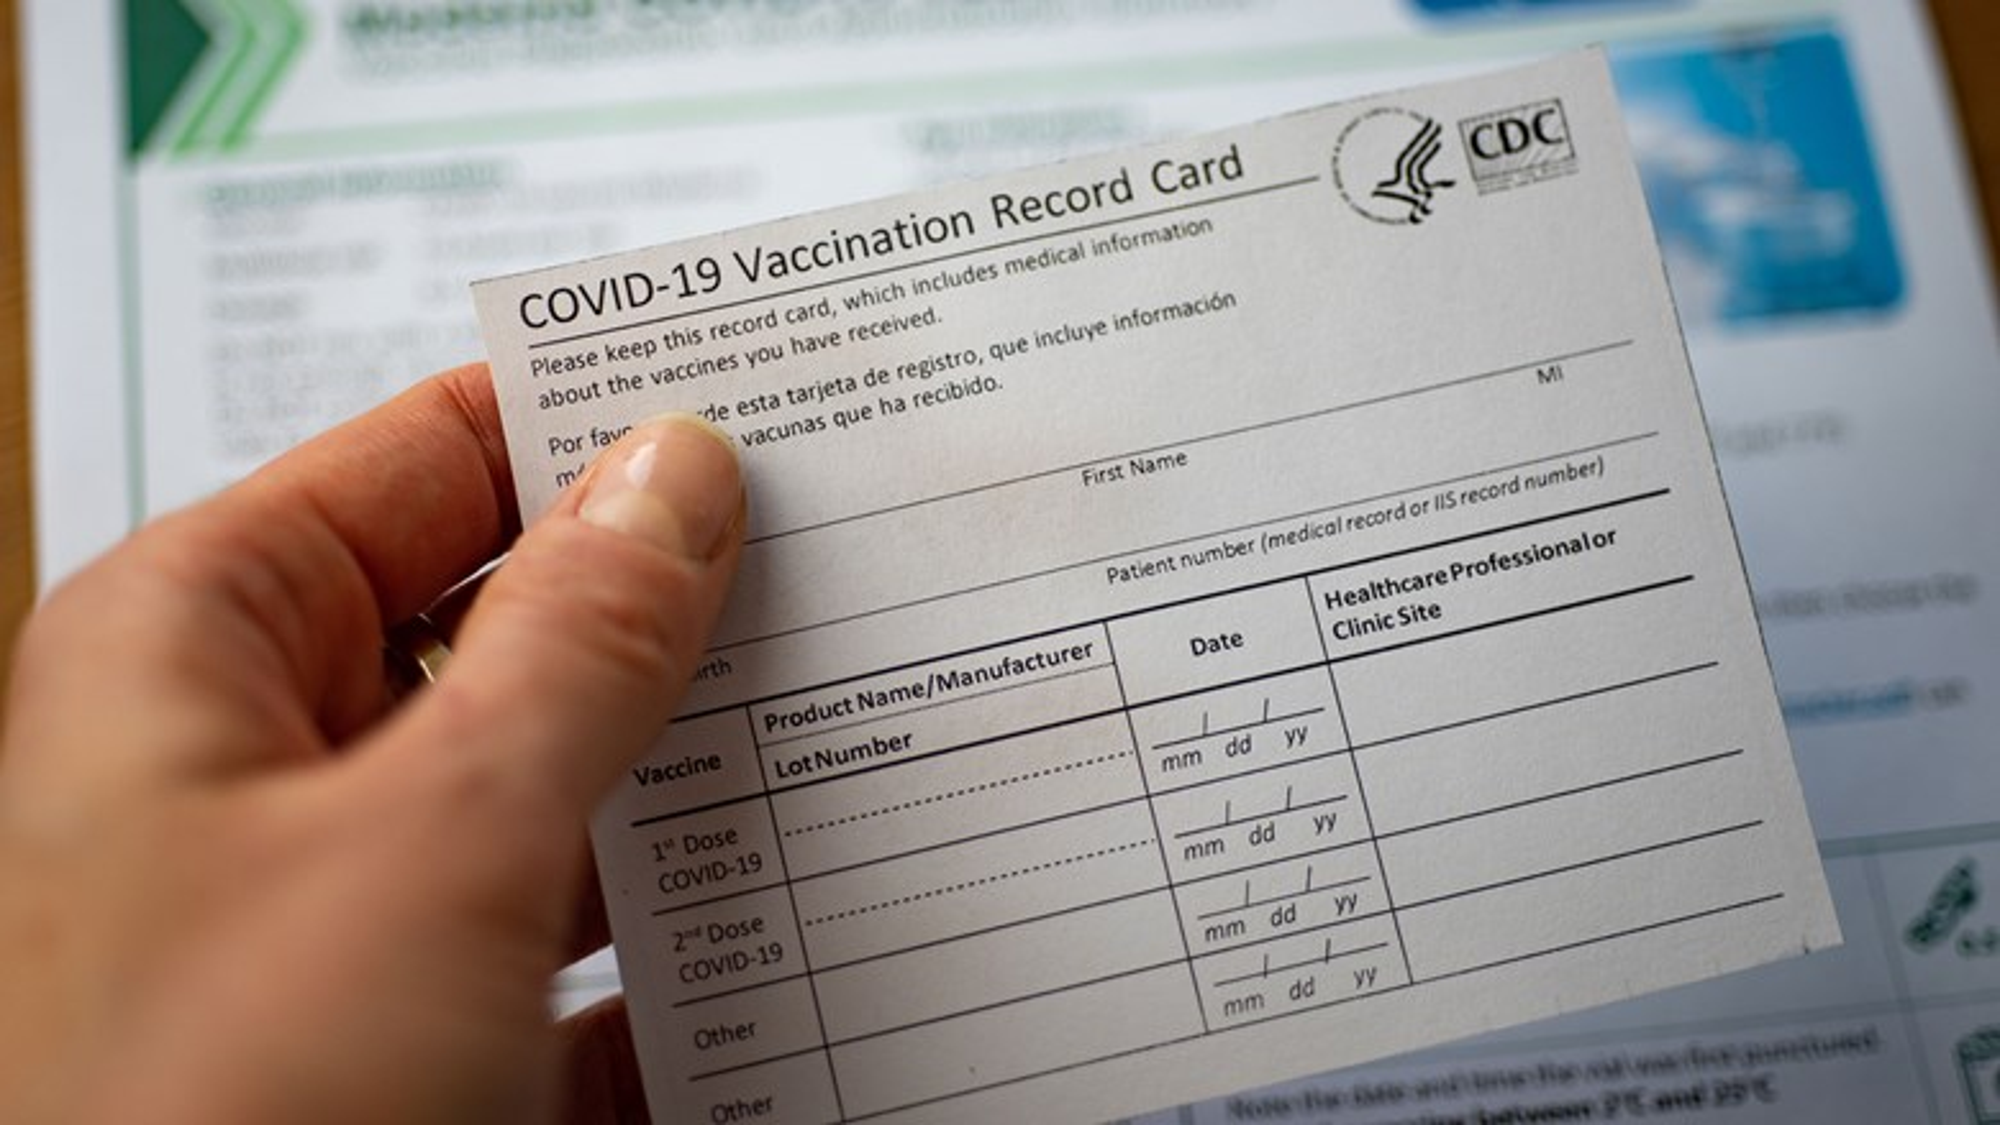 Vaccine record covid [Credit: Evgenia Parajanian/Shutterstock.com]